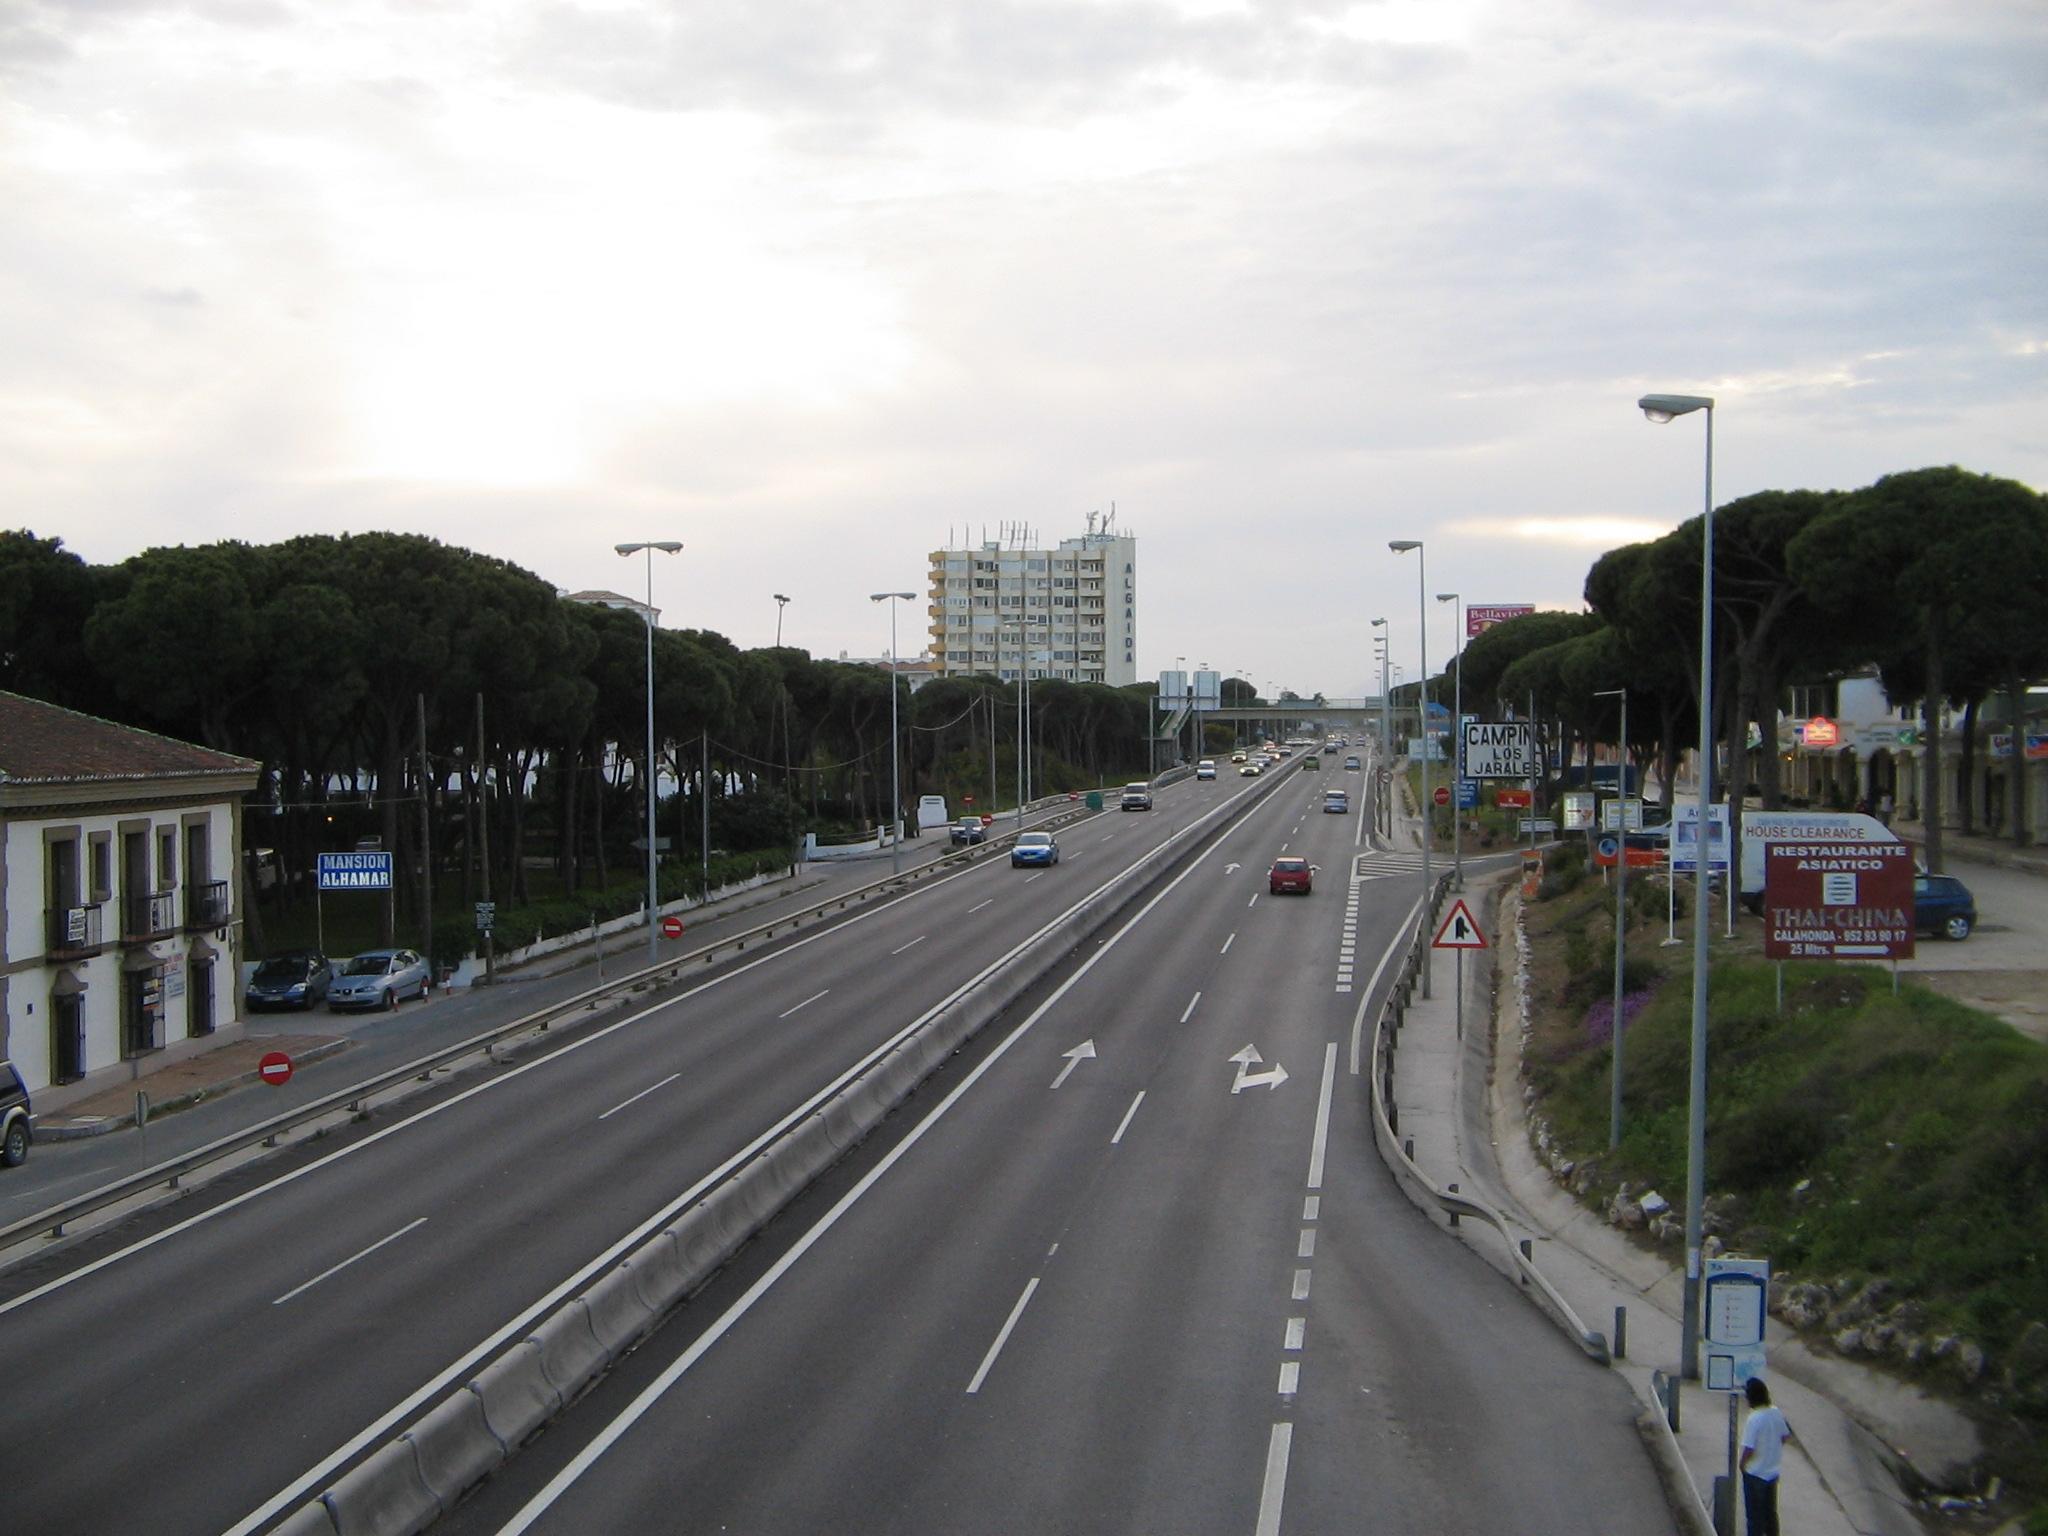 File:The highway in Calahonda, Spain 2005.jpg - Wikimedia Commons